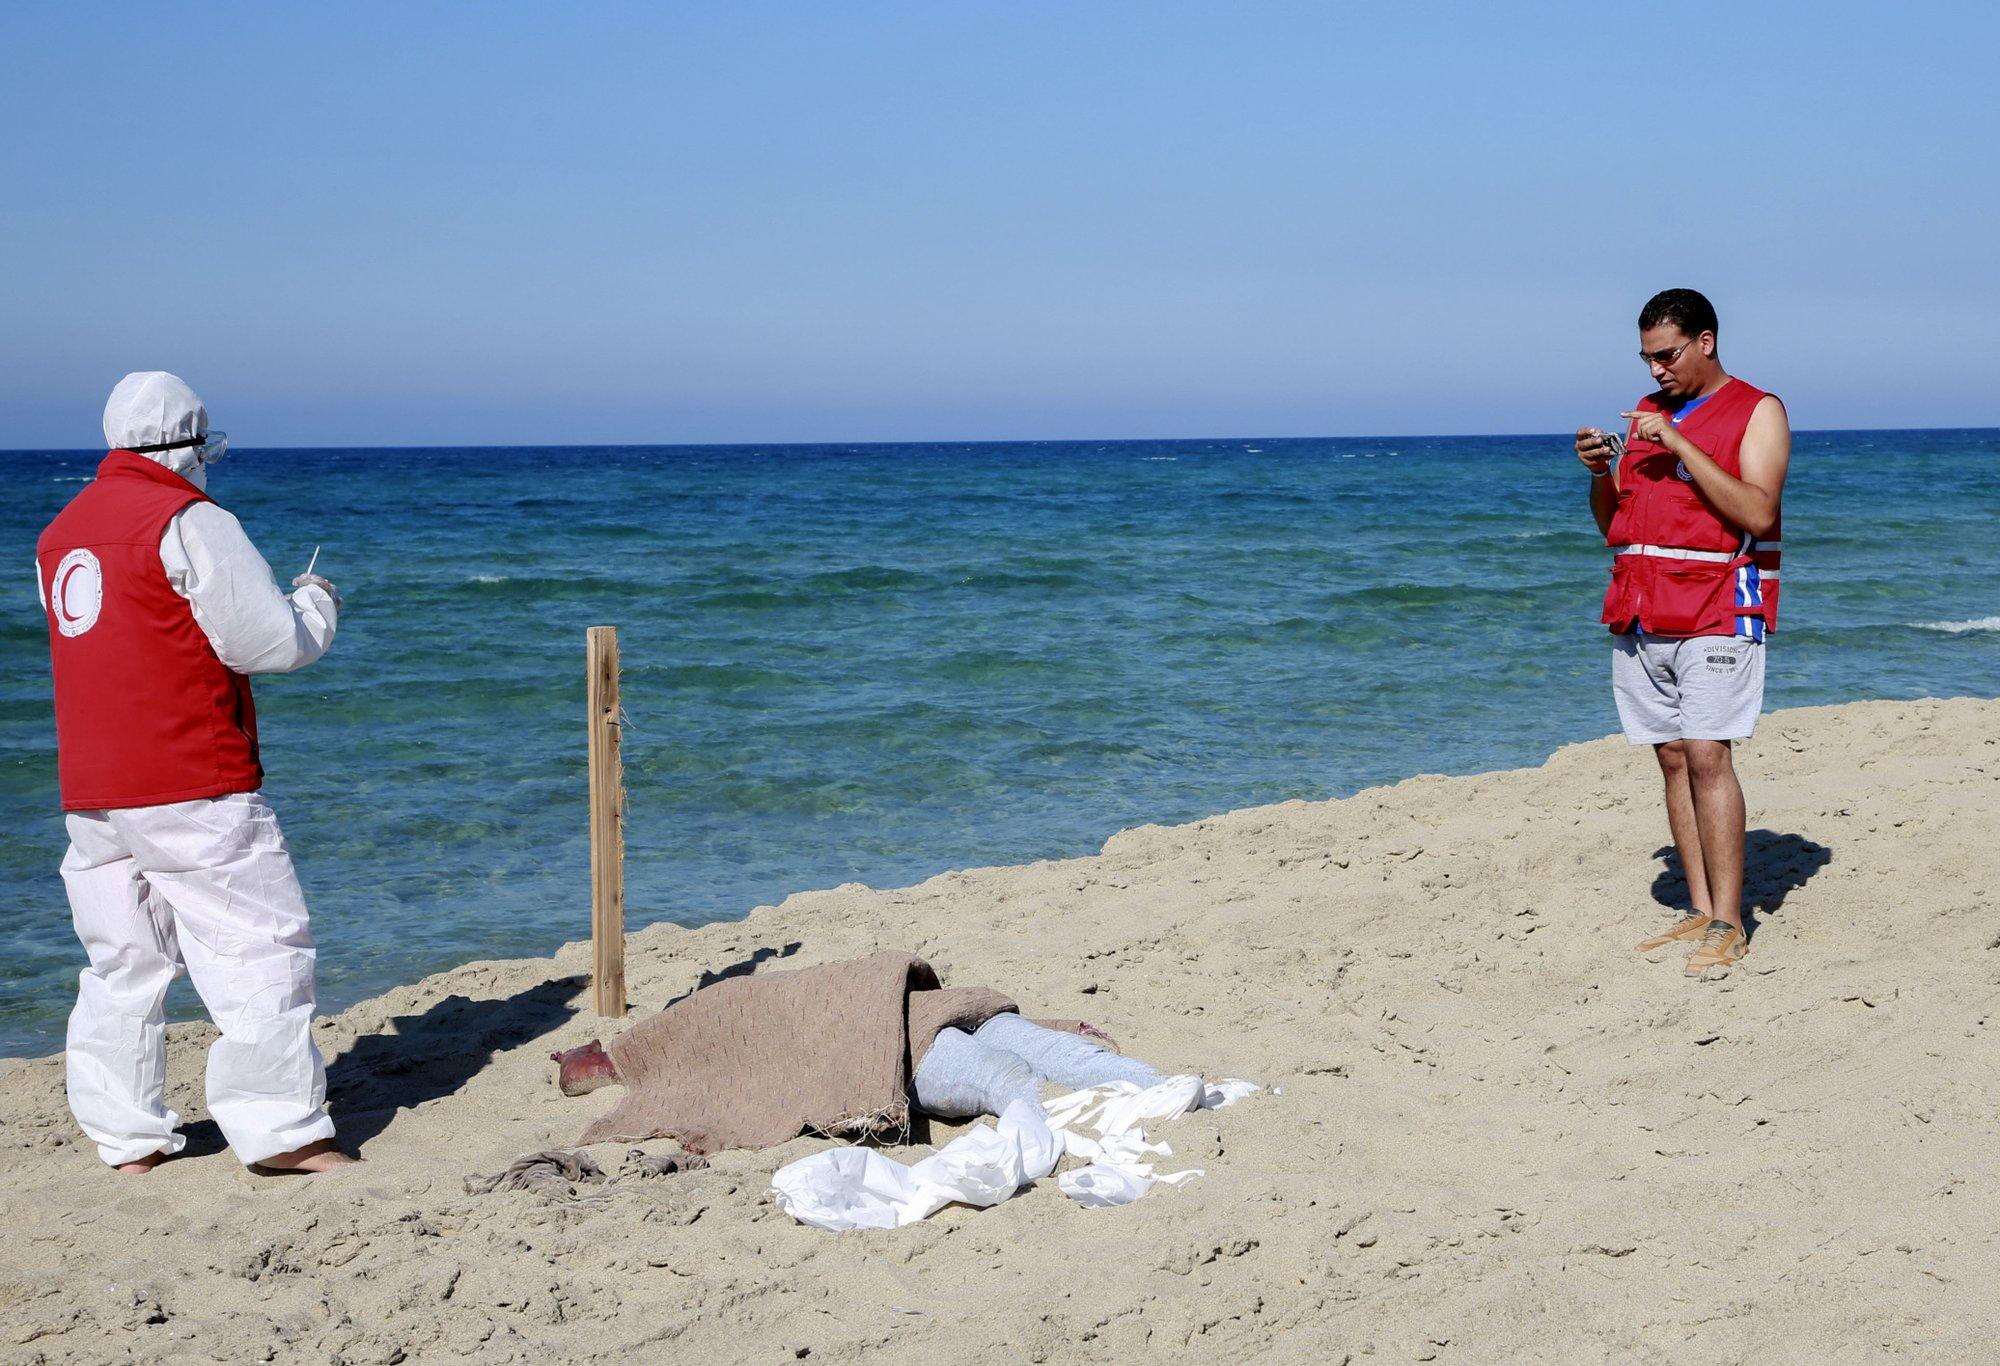 Libya's coast guard recovers dozens of bodies of migrants